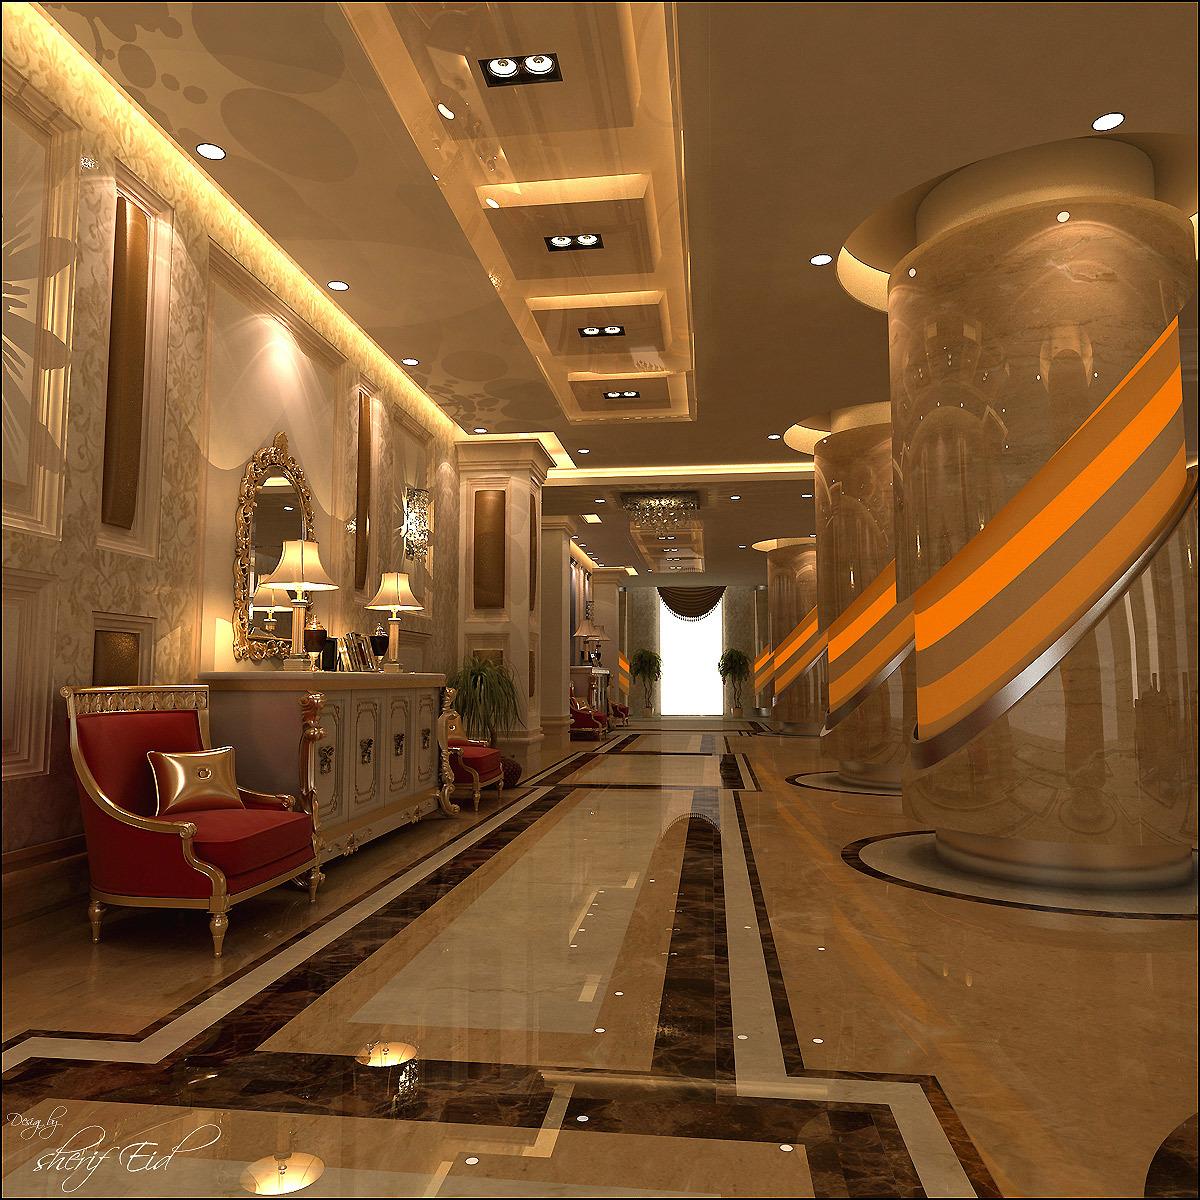 Shdesigner hotel interior 1 a1938449 to1p